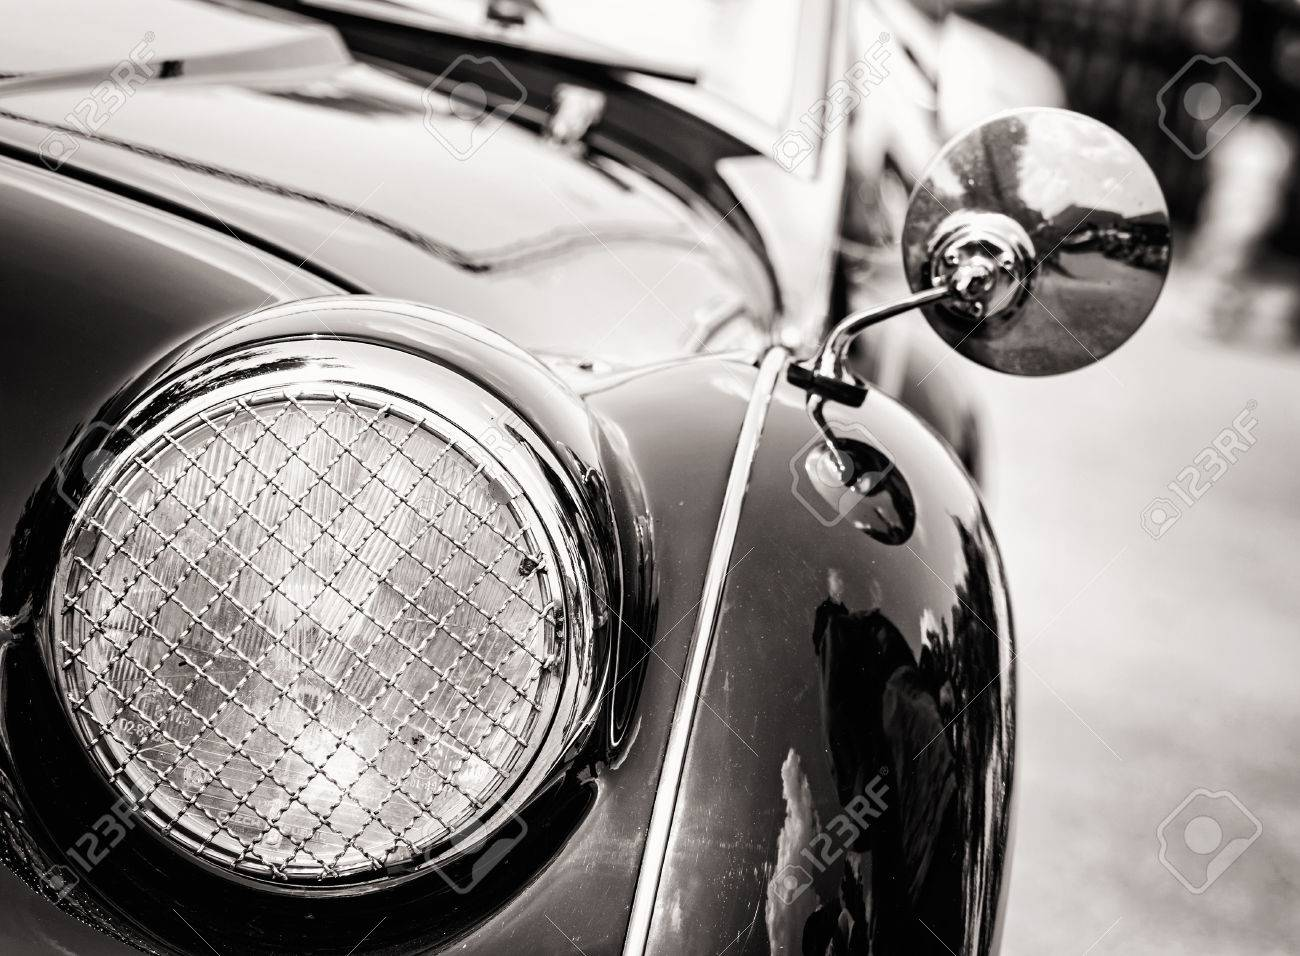 Shiny vintage car. Detail view of the headlight. Retro car. Black and white photo. Front light. Retro automobile scene. Circle headlamp. - 58033845